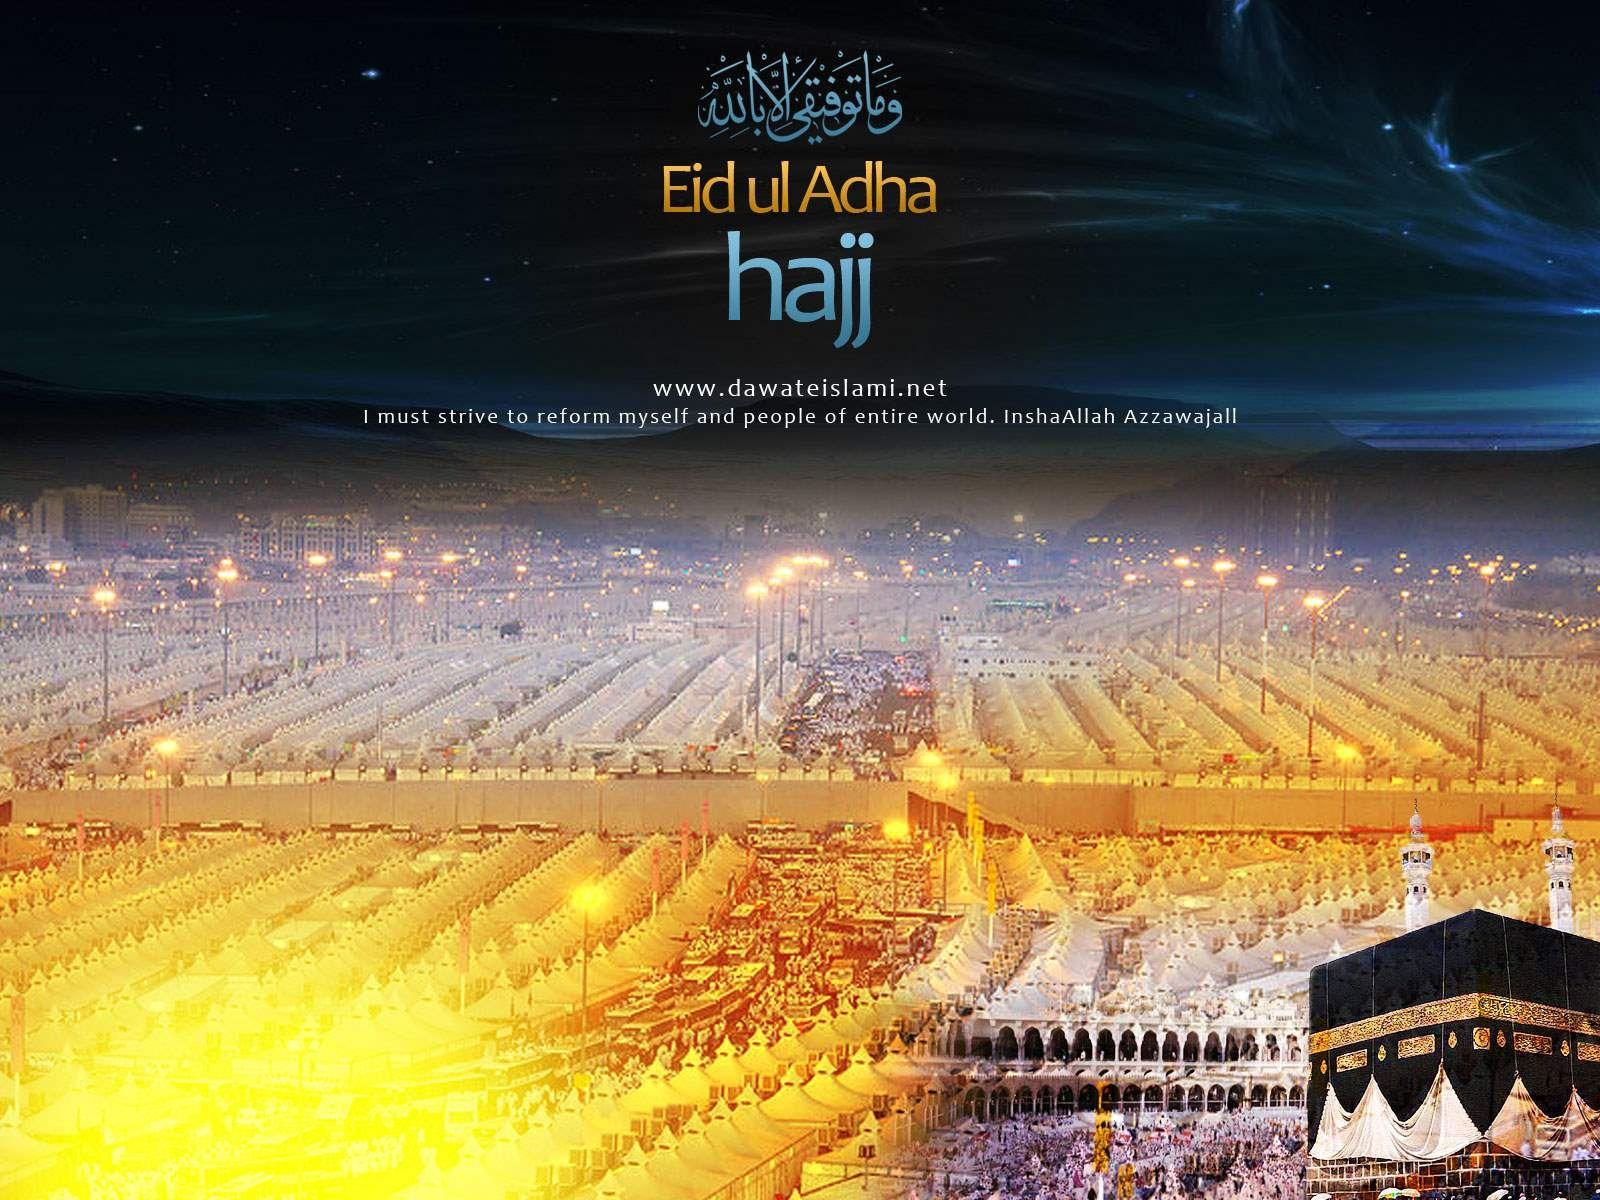 Hajj eid al adha 2015 hd wallpapers and greeting cards eid hd new hajj mubarak 2014 15 16 path of heaven wallpaper kristyandbryce Images